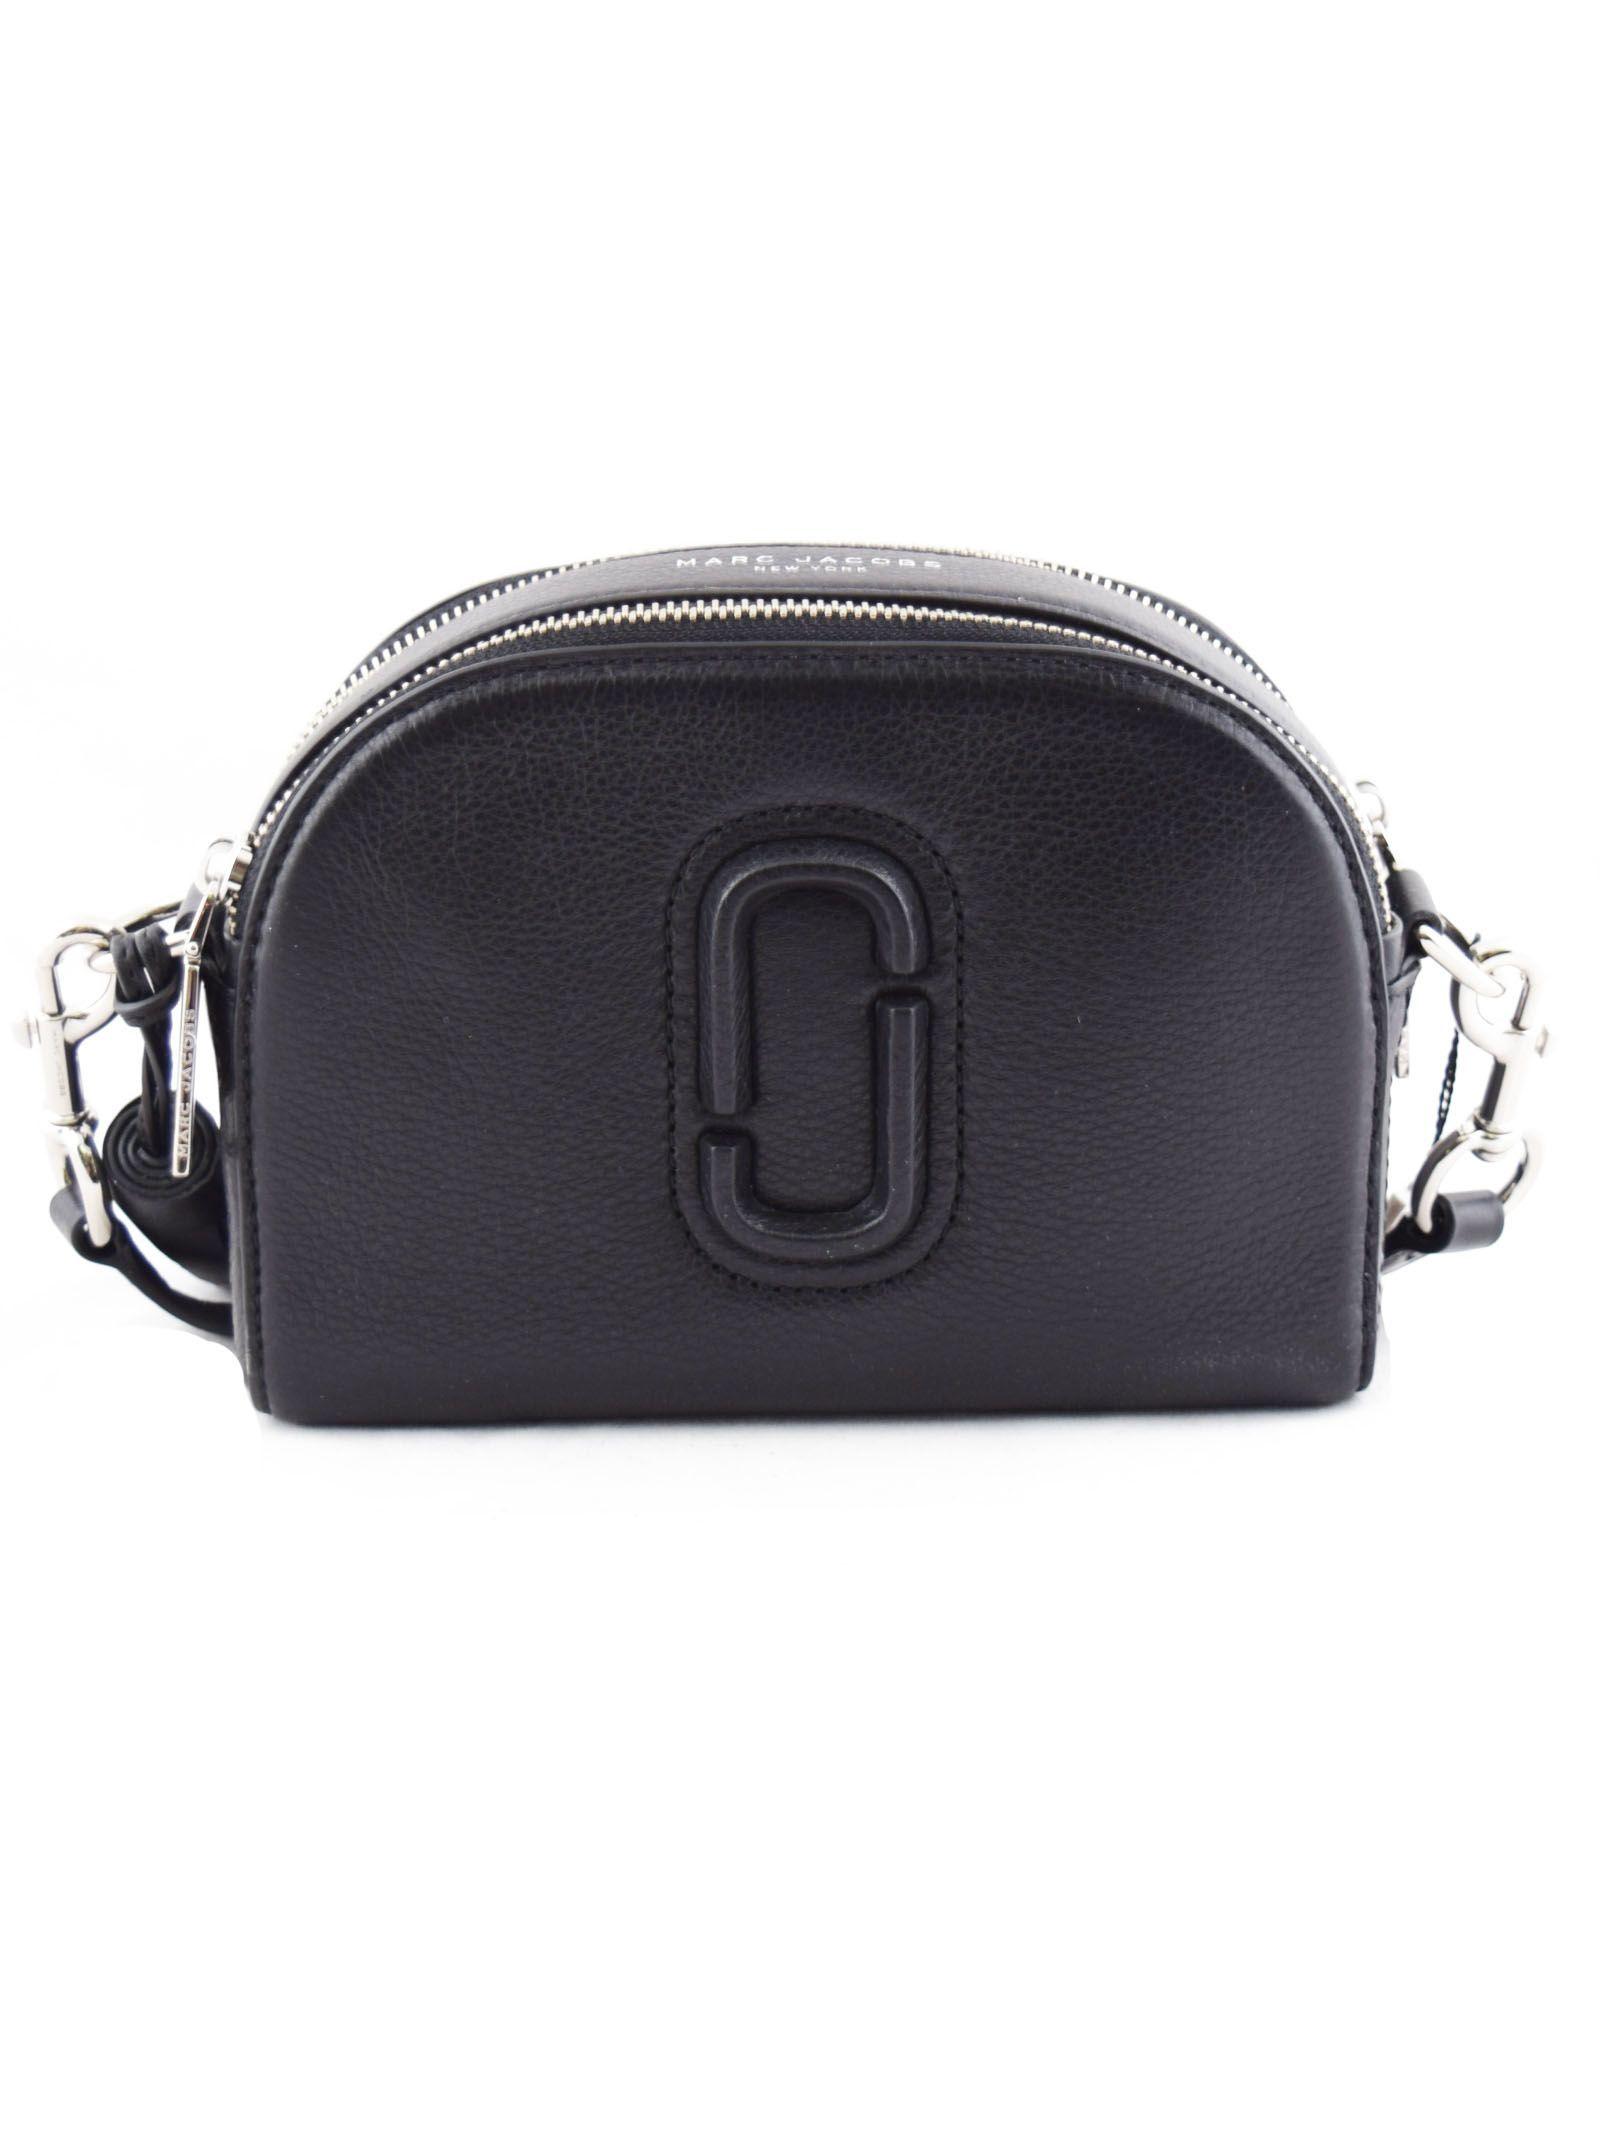 8b36854f53b MARC JACOBS . #marcjacobs #bags #shoulder bags # | Marc Jacobs